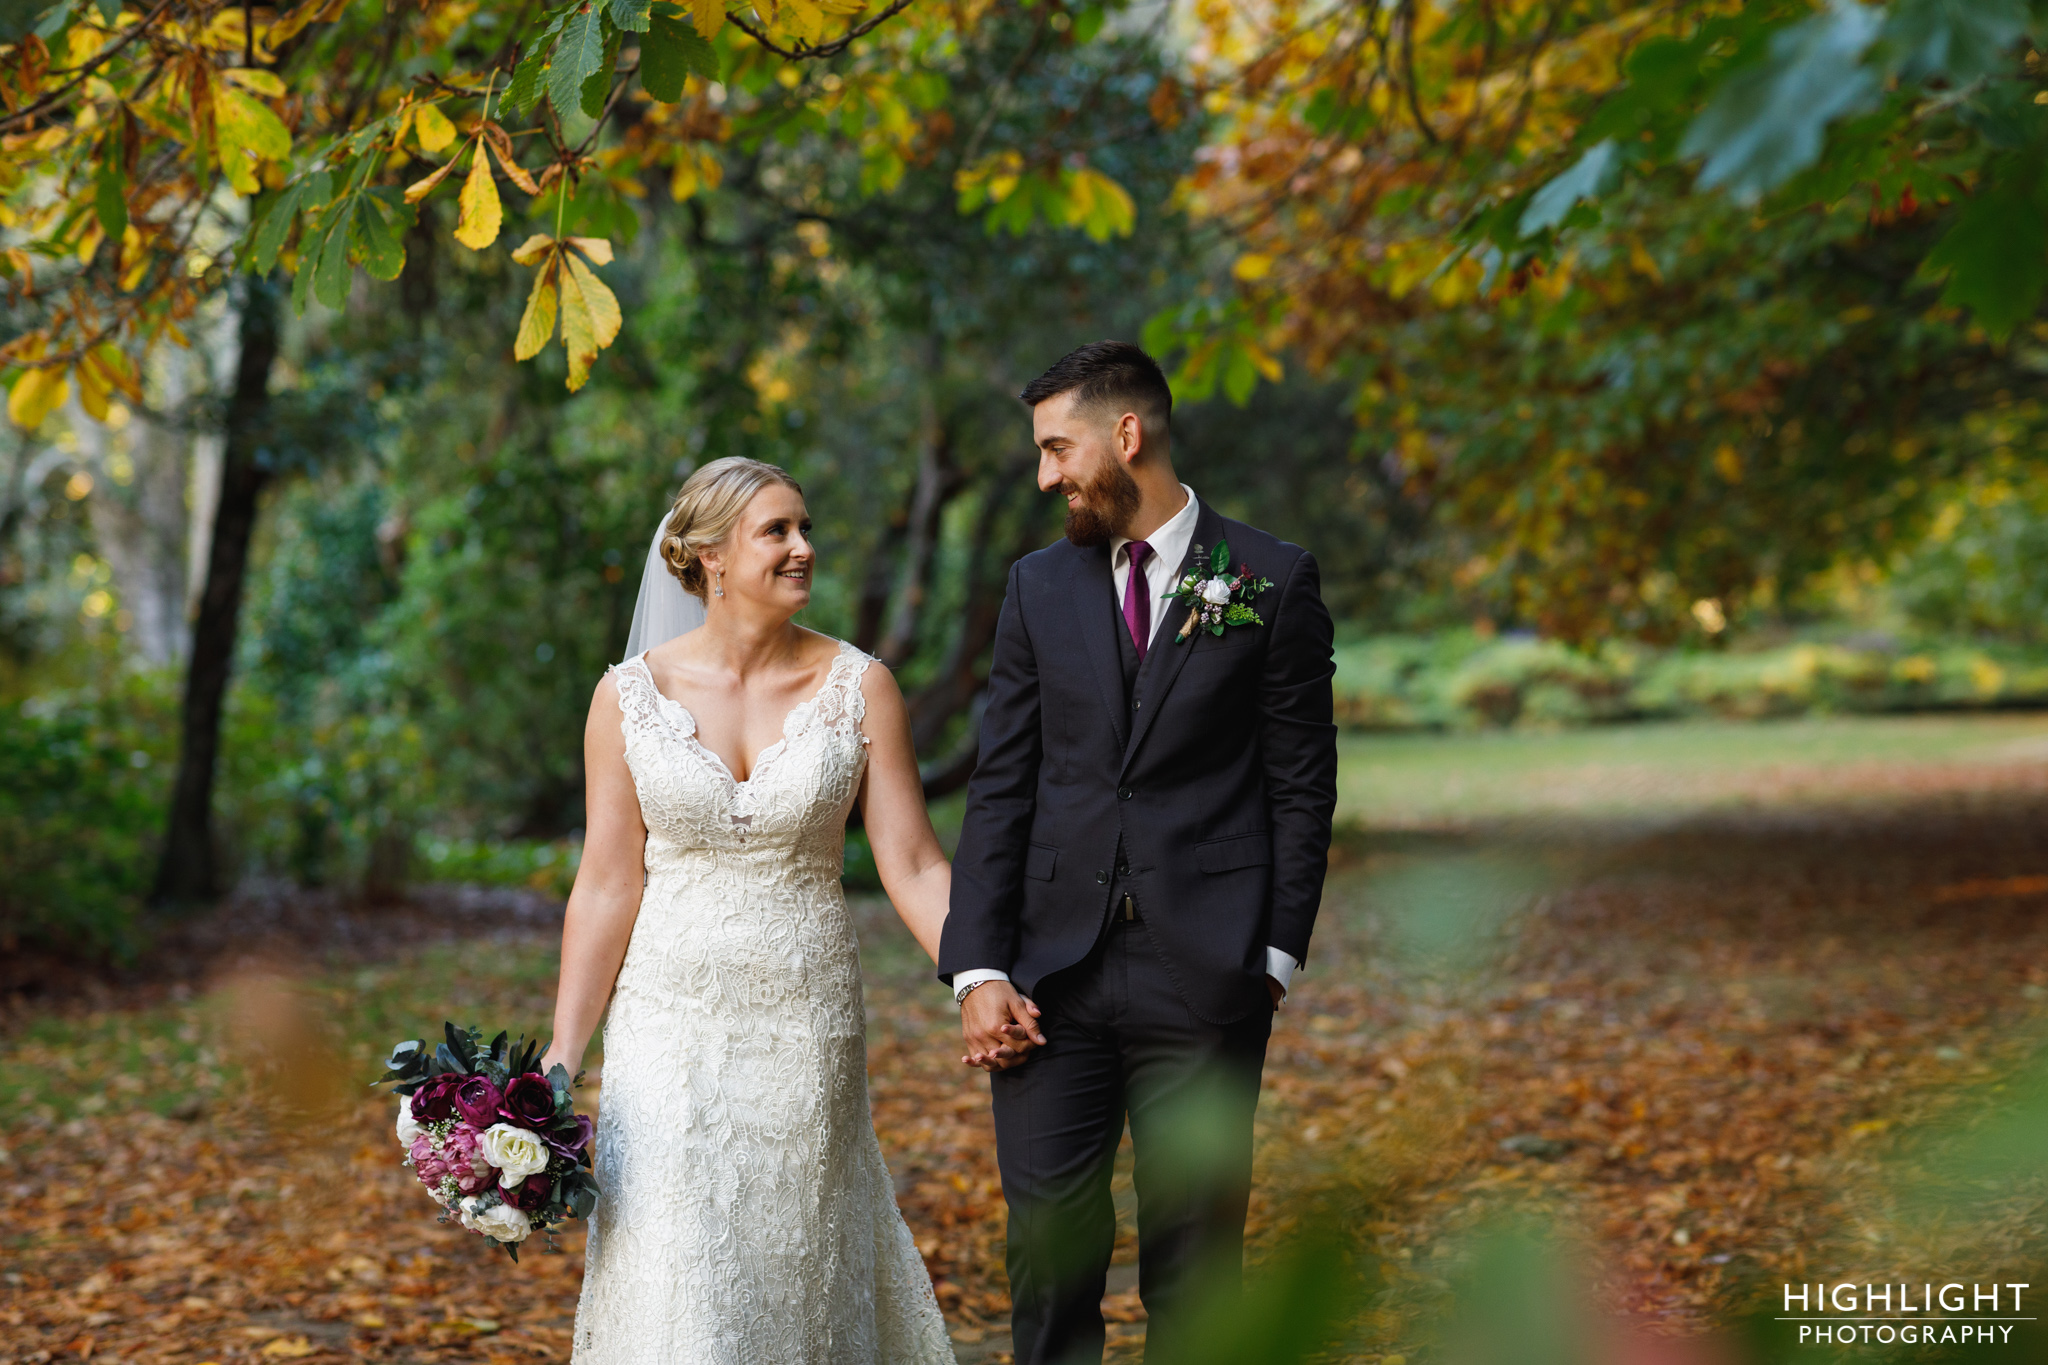 highlight-wedding-photography-feilding-new-zealand-144.jpg